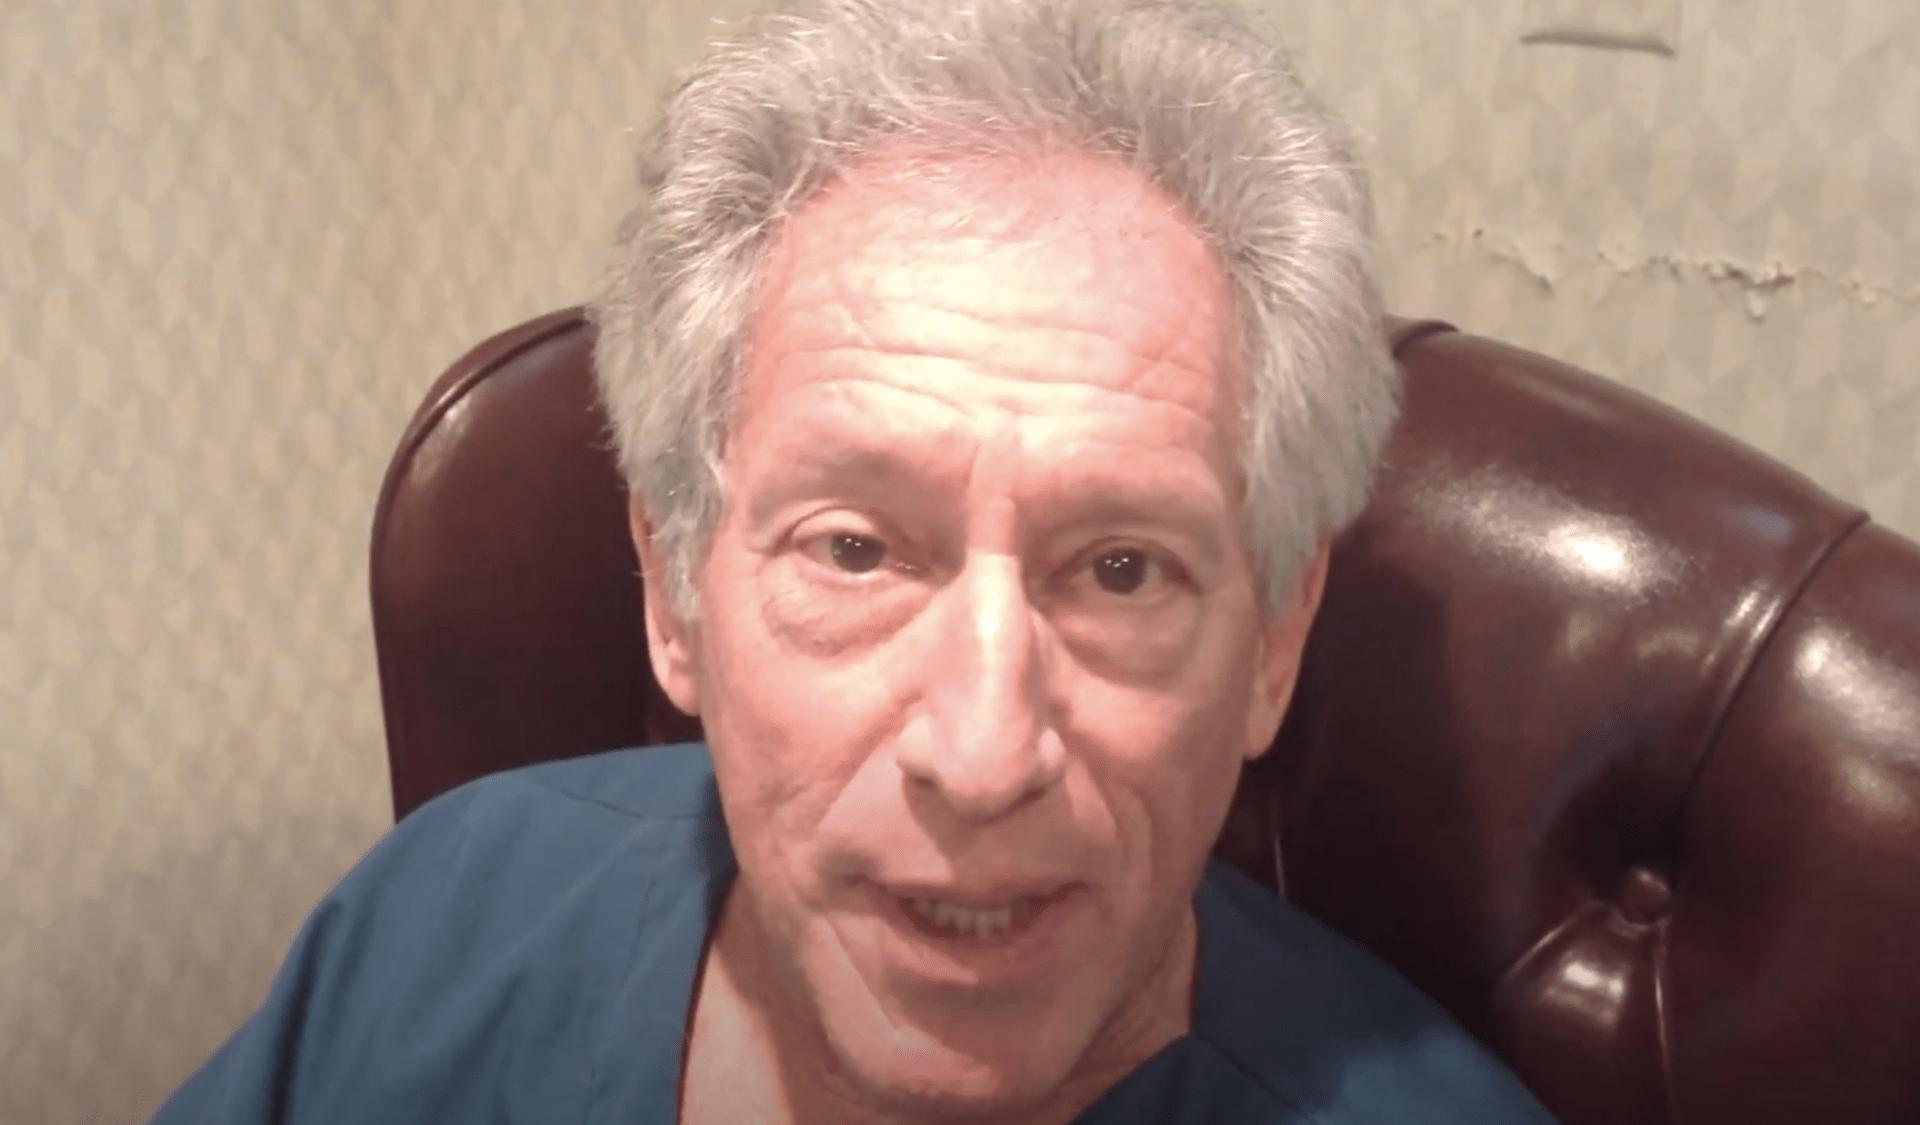 Dr. Larry Shapiro